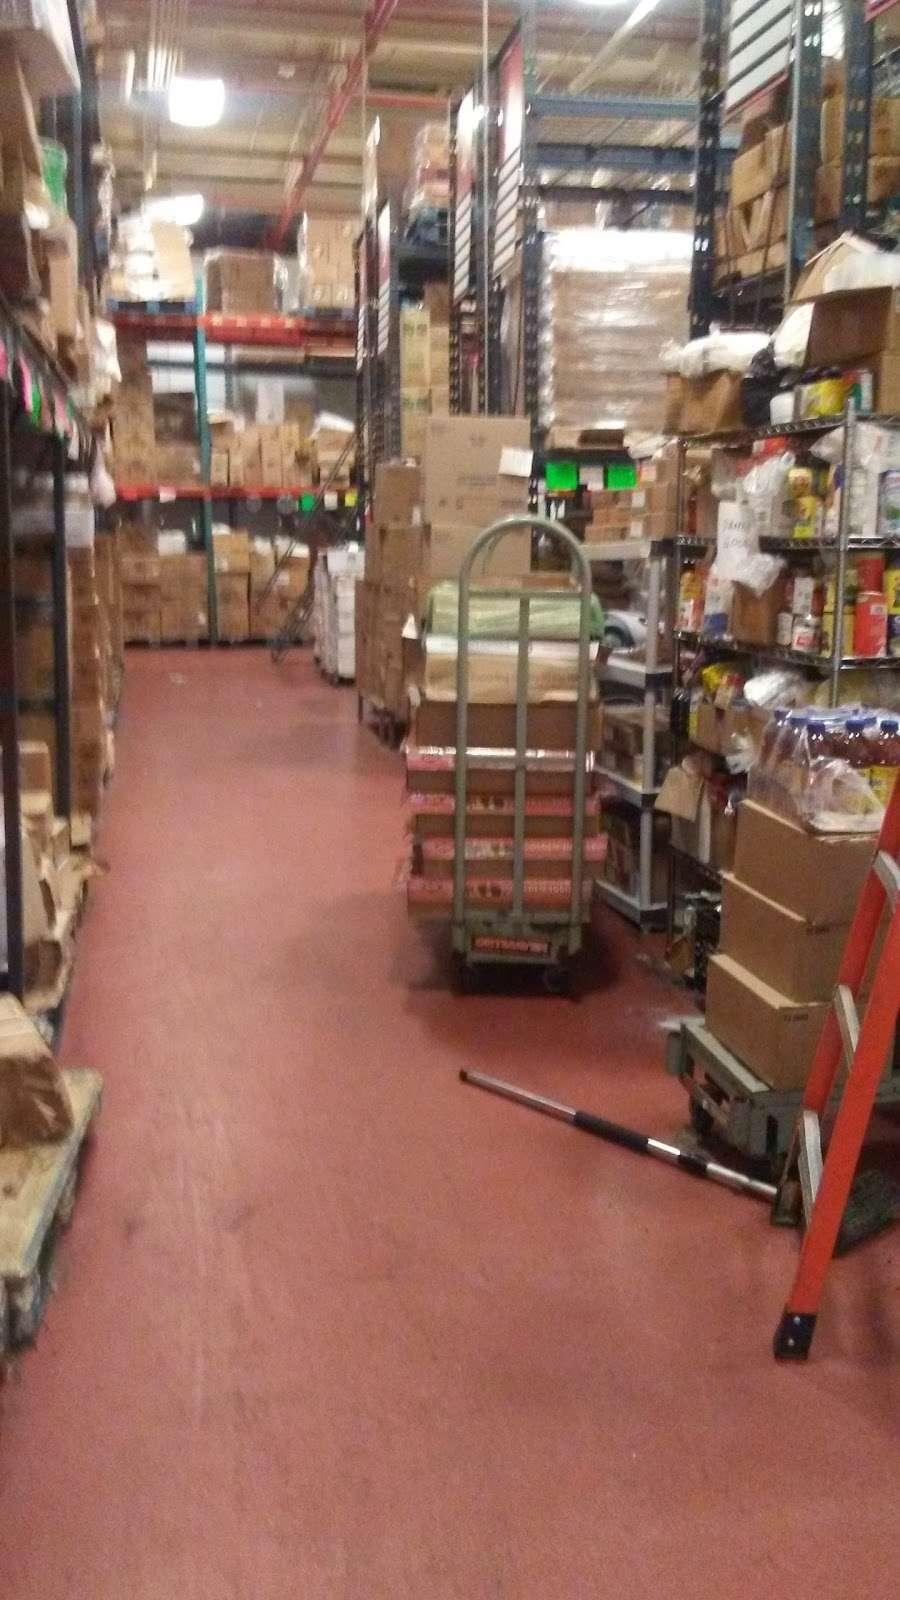 Food Saver New York - store    Photo 8 of 8   Address: 412 E 83rd St, Brooklyn, NY 11236, USA   Phone: (718) 209-9300